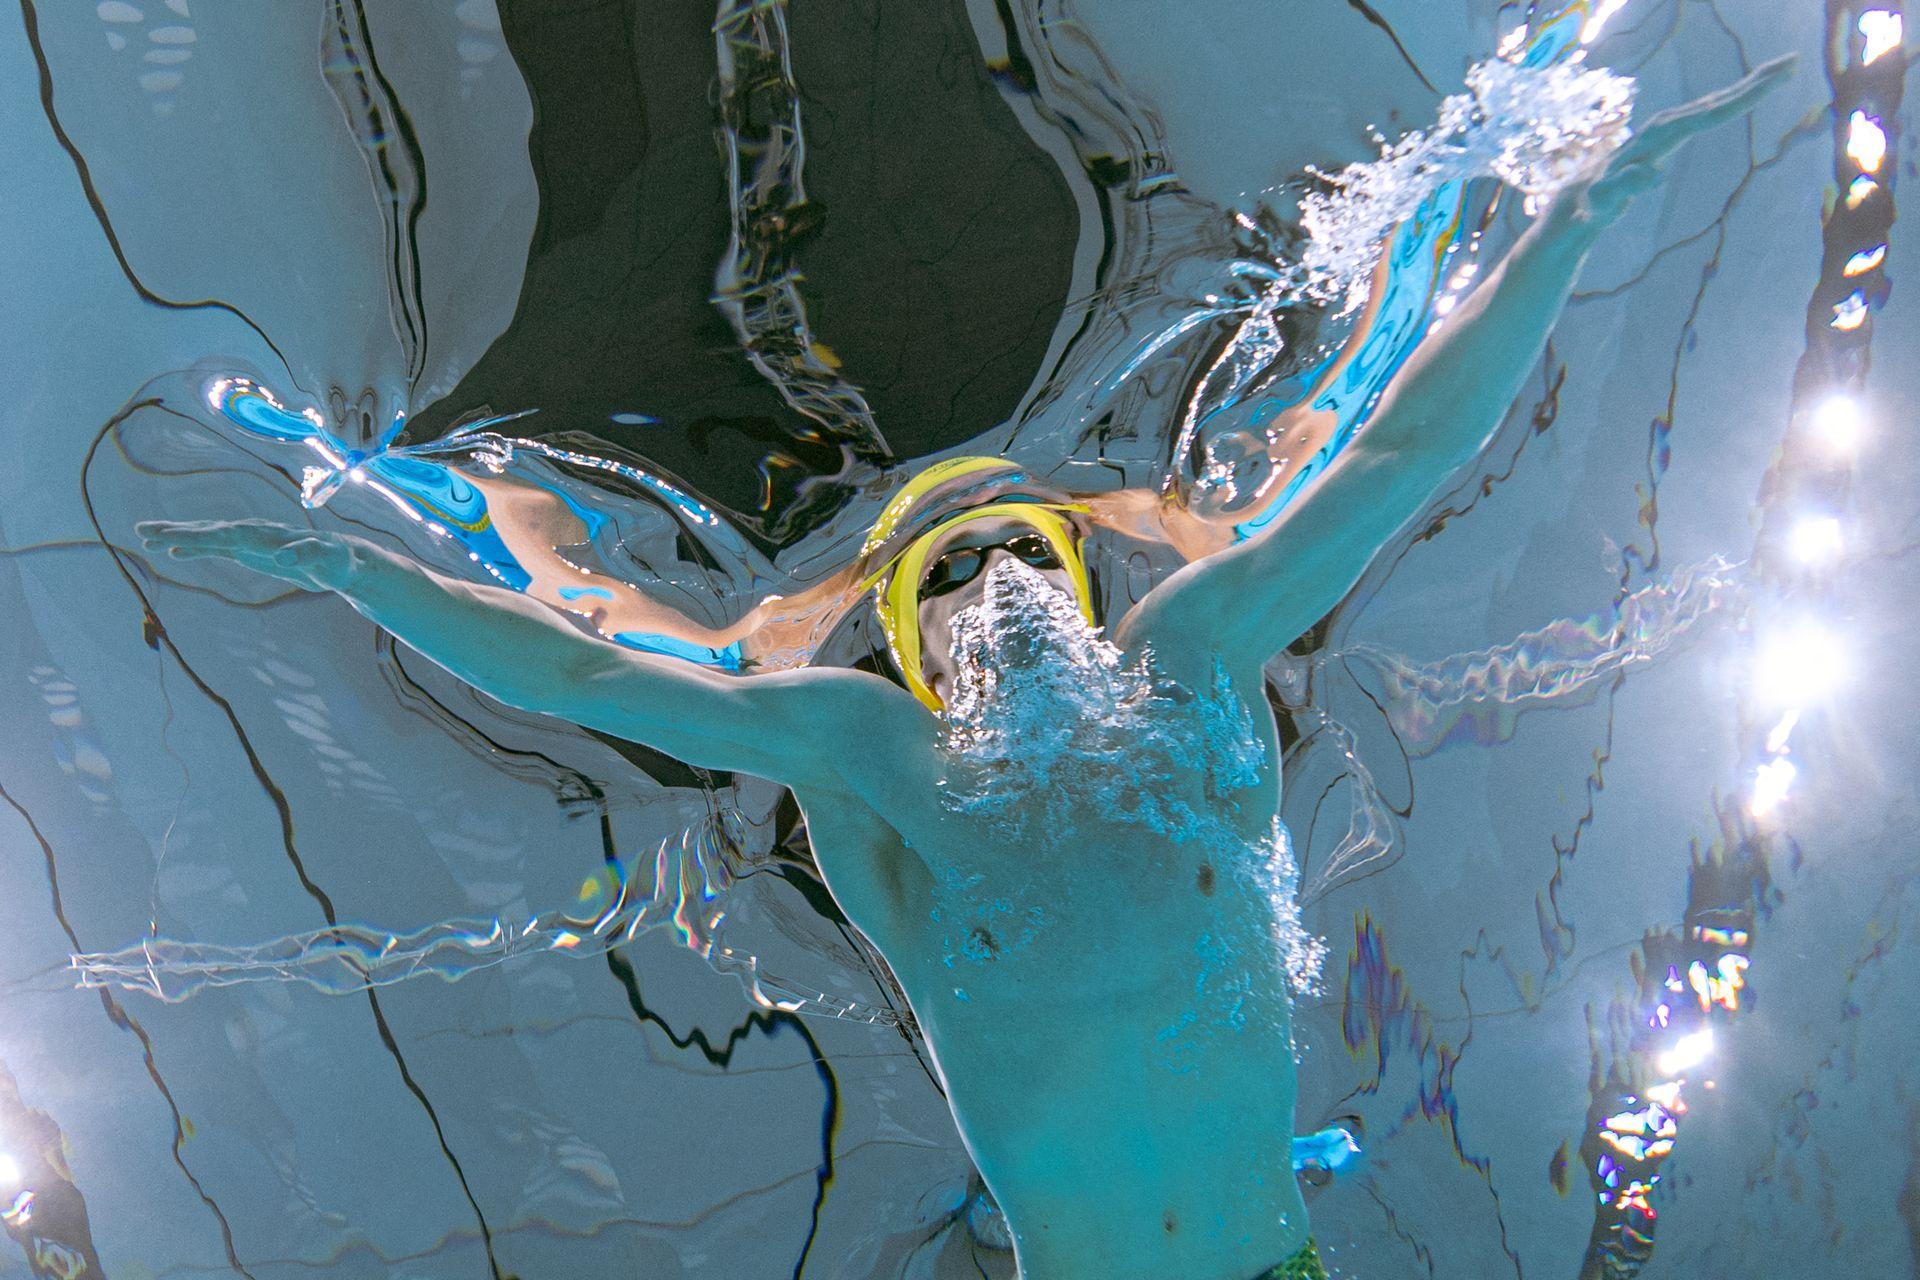 El australiano Izaac Stubblety-Cook compite en la eliminatoria de natación masculina de 200 m